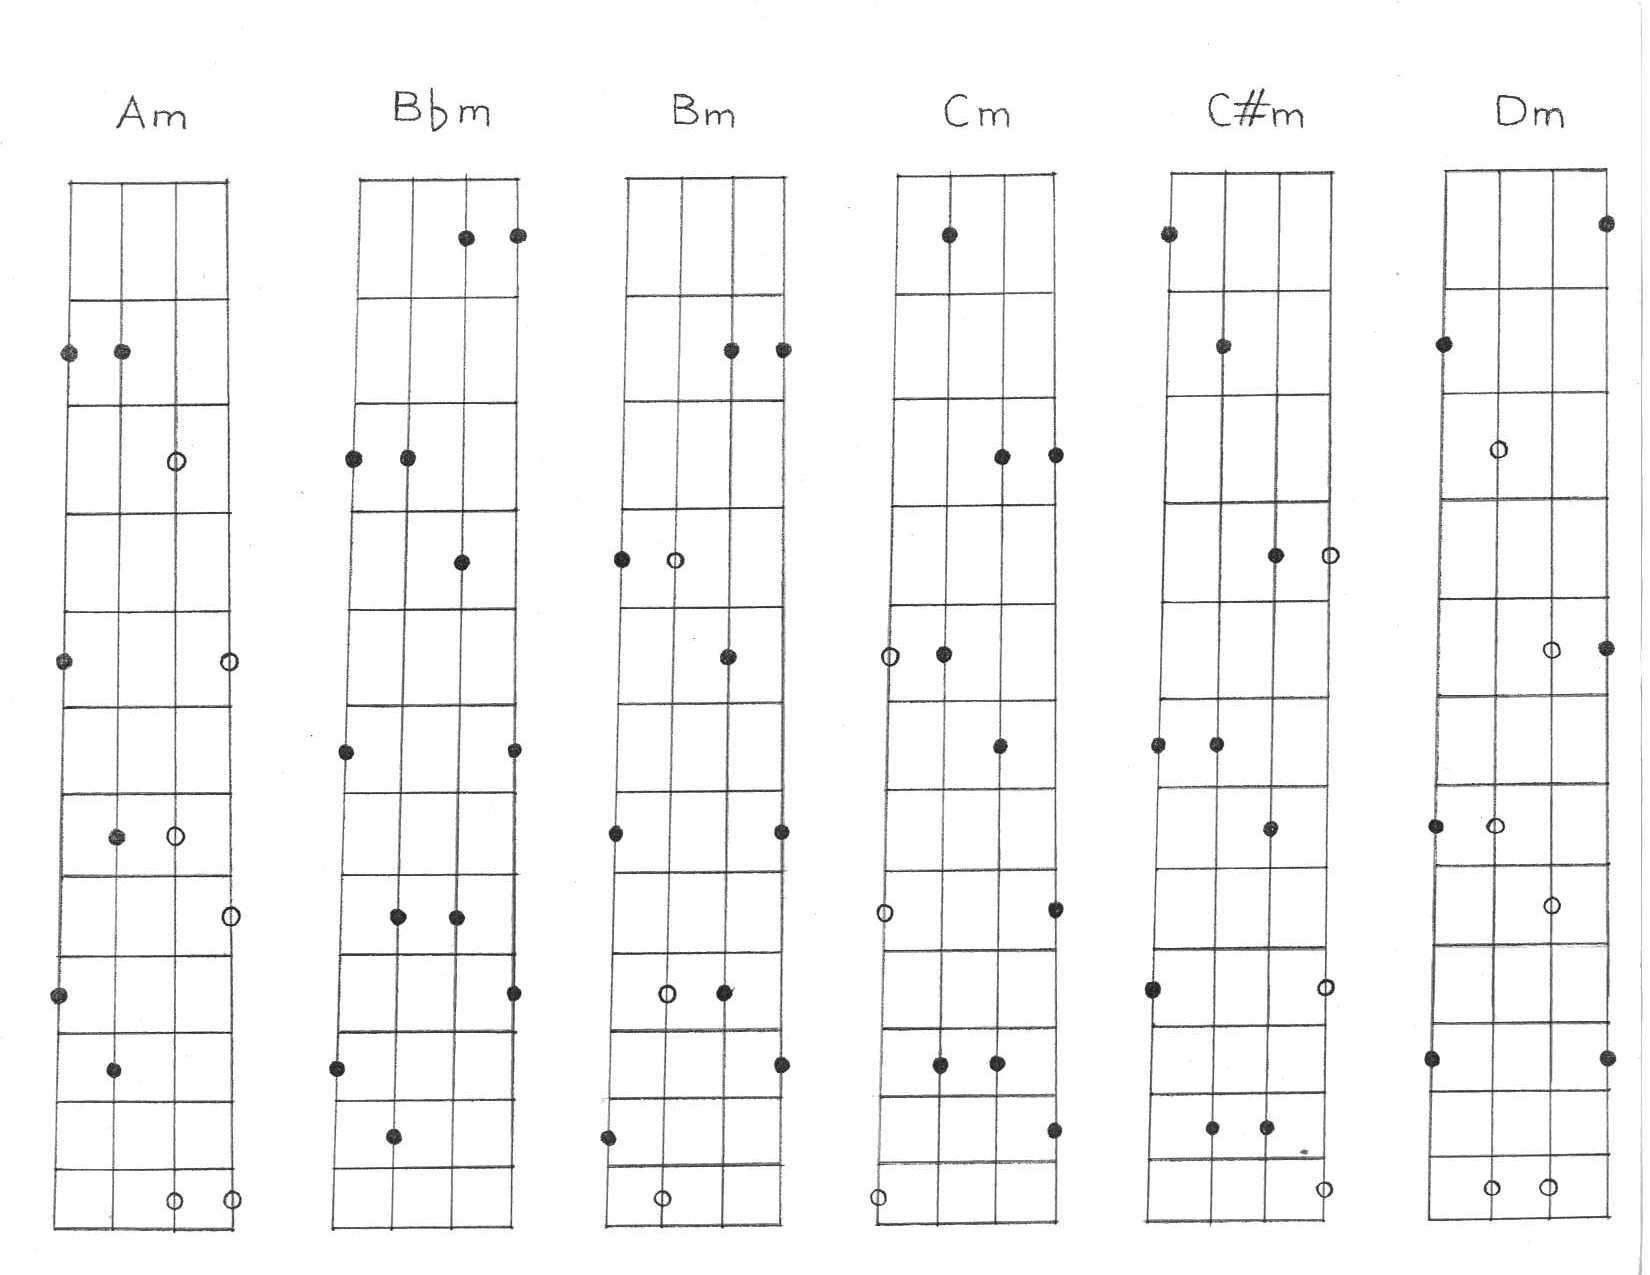 http://acousticmusictv.com/images/Mandolin%20Art/17_MandolinTwoFingerChord_500.jpg